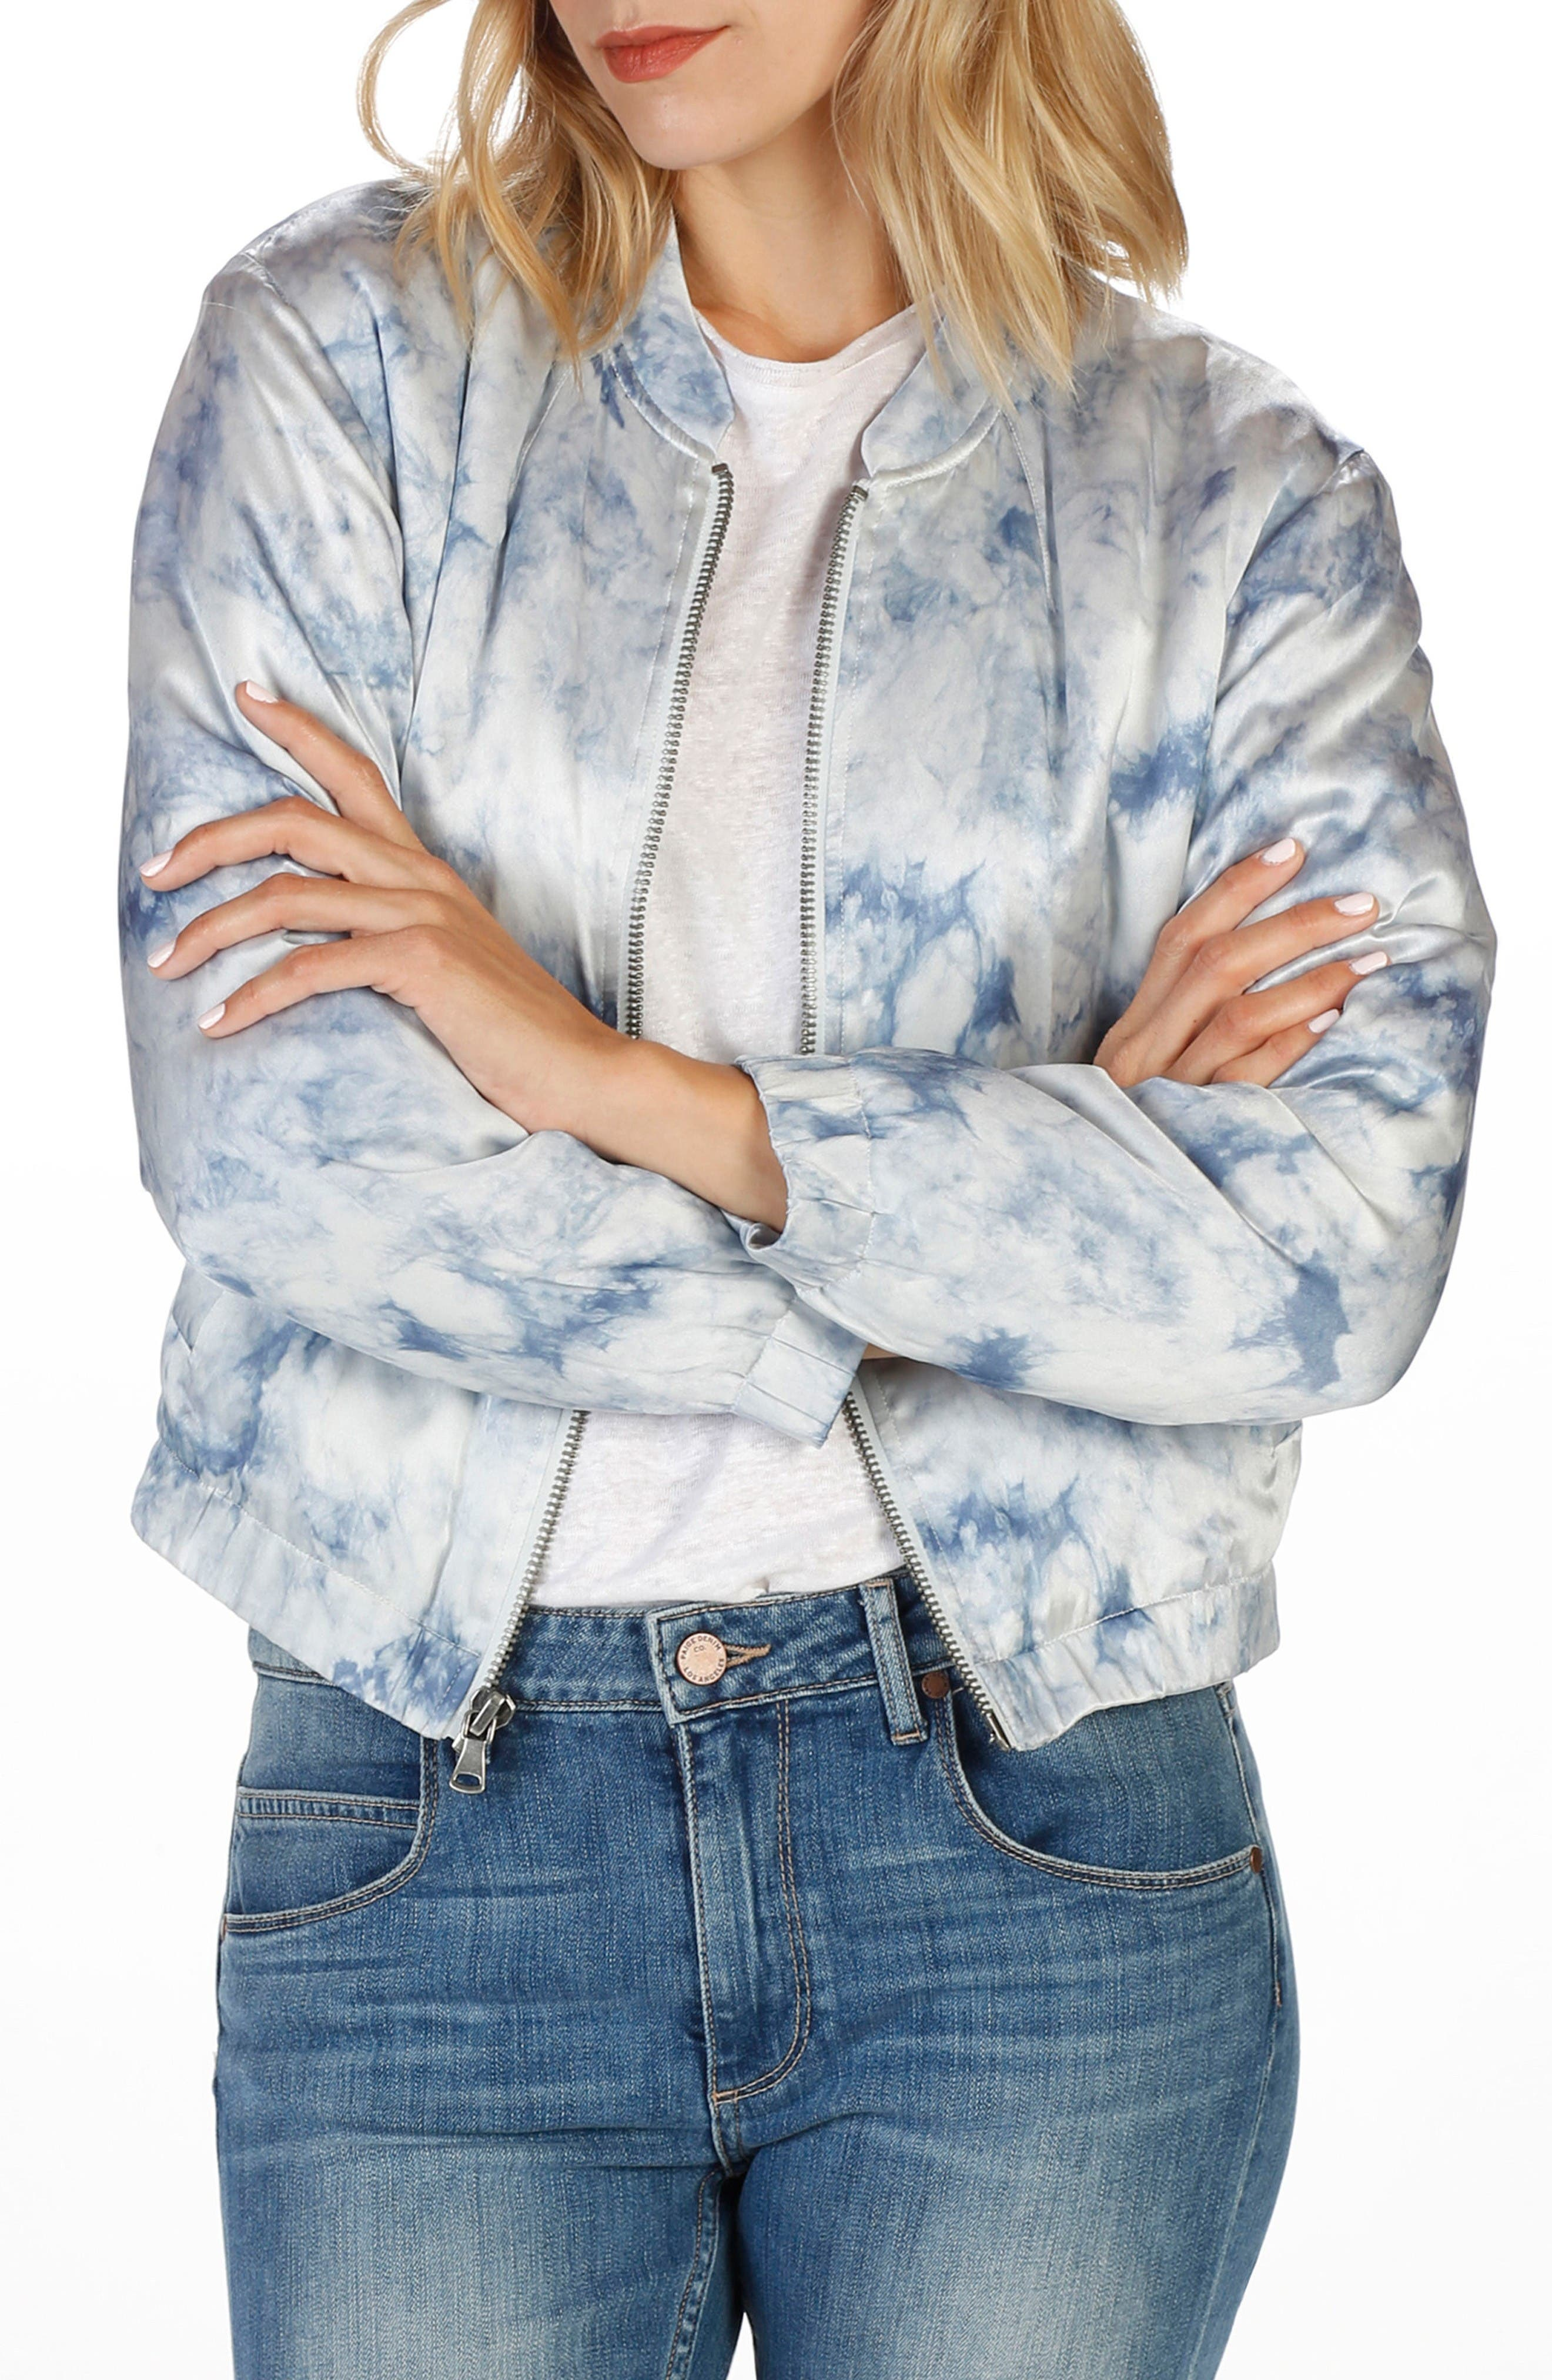 Main Image - Rosie HW x PAIGE Flo Silk Bomber Jacket